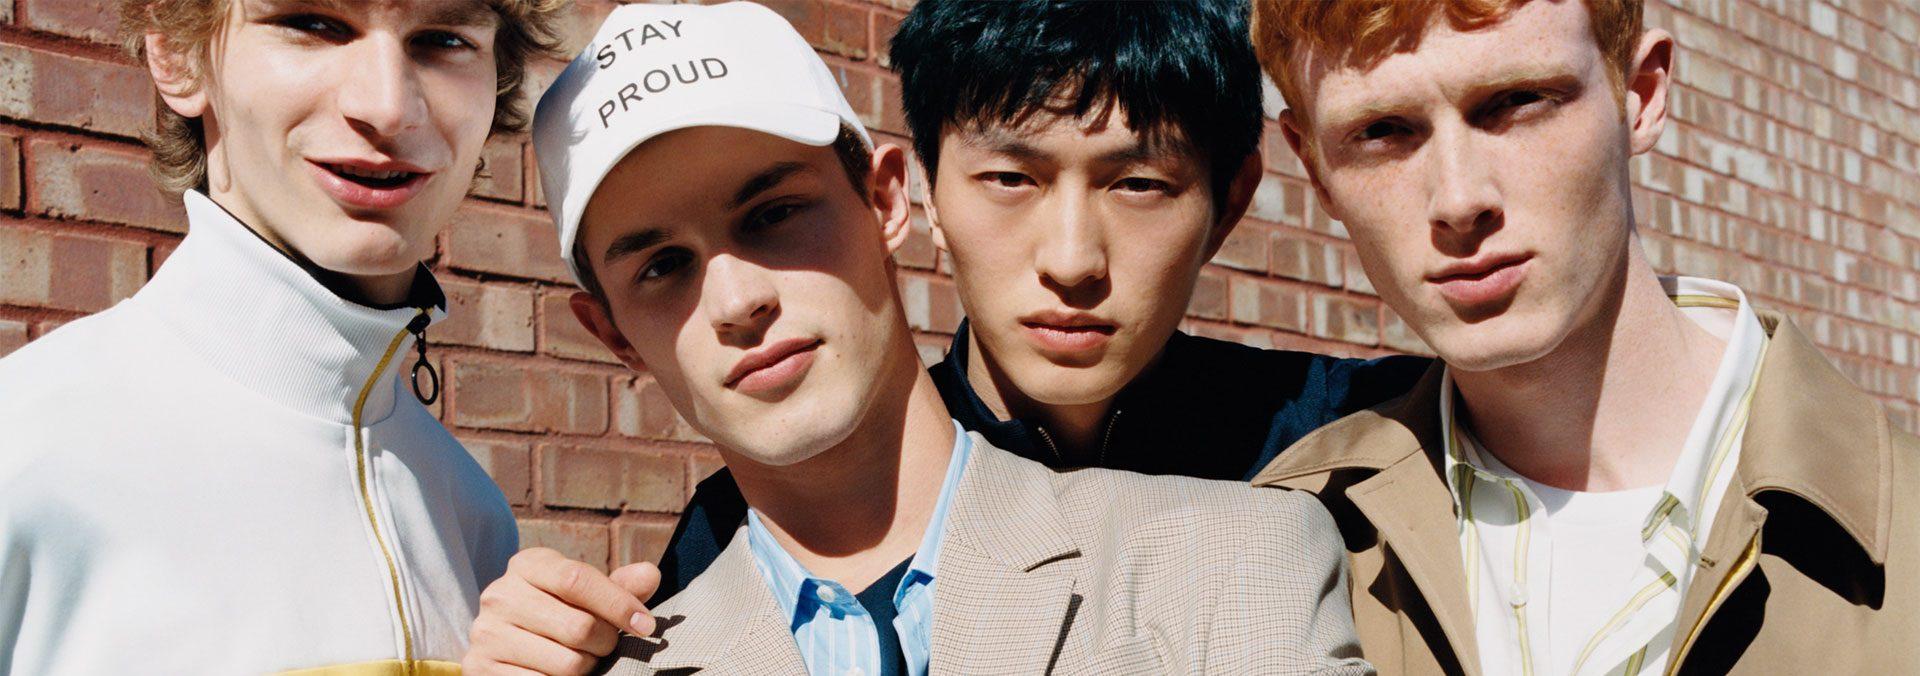 - 40% OFF on Men's Fashion